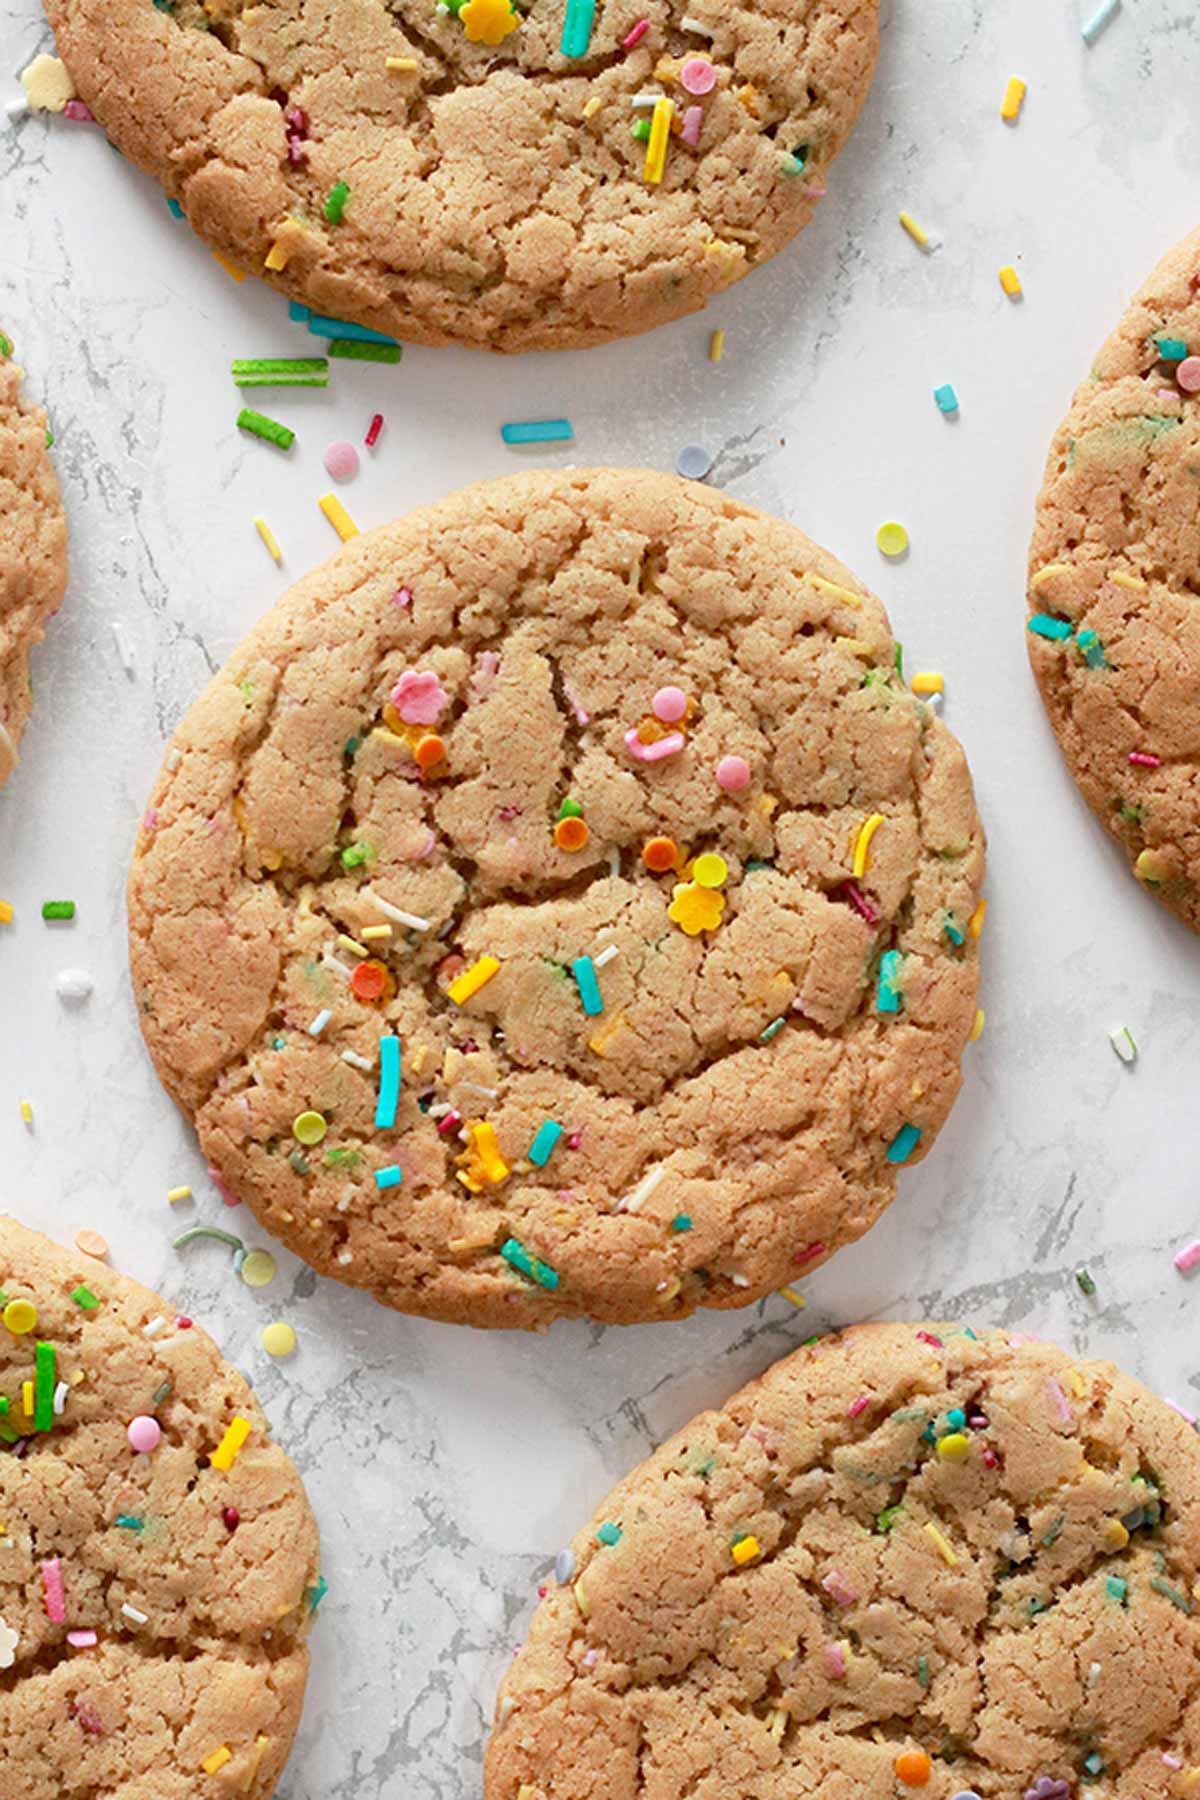 Vegan Funfetti Cookies Laying Flat On A White Background